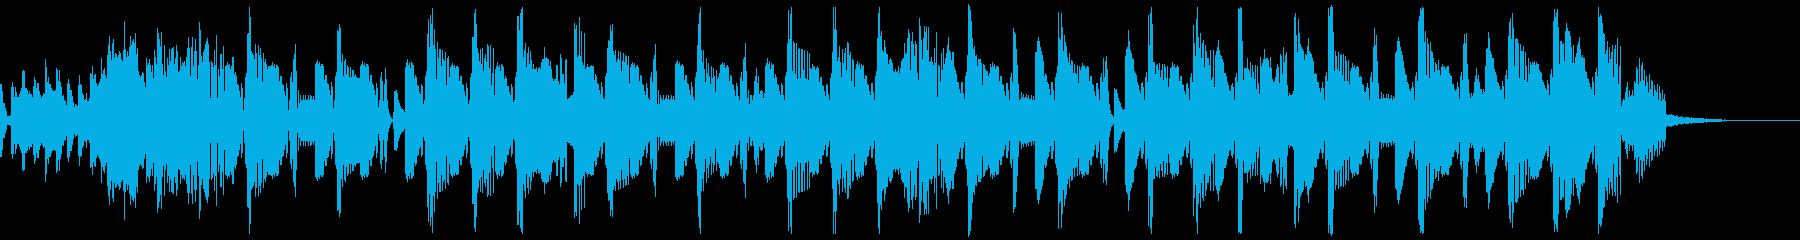 G-Houseジングル1の再生済みの波形